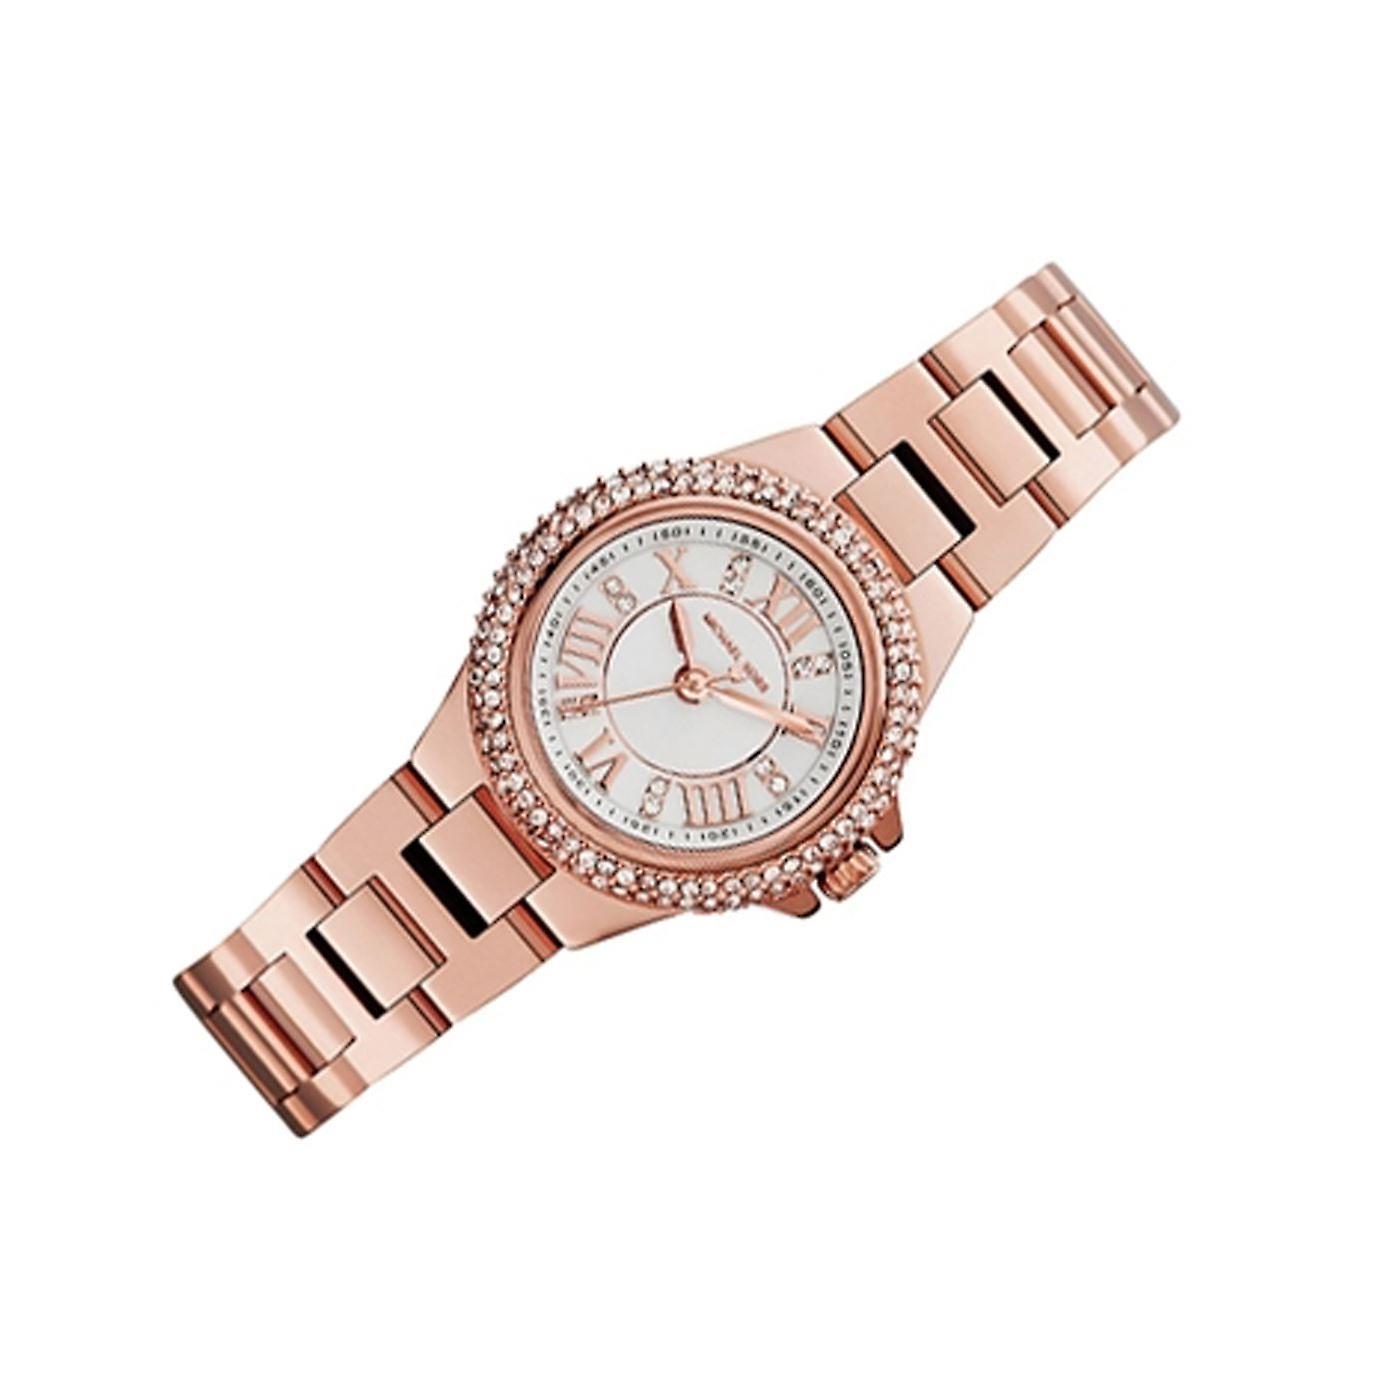 2241c6cb3401 Michael Kors Ladies Watch Mini Camille Petite Rose Gold MK3253